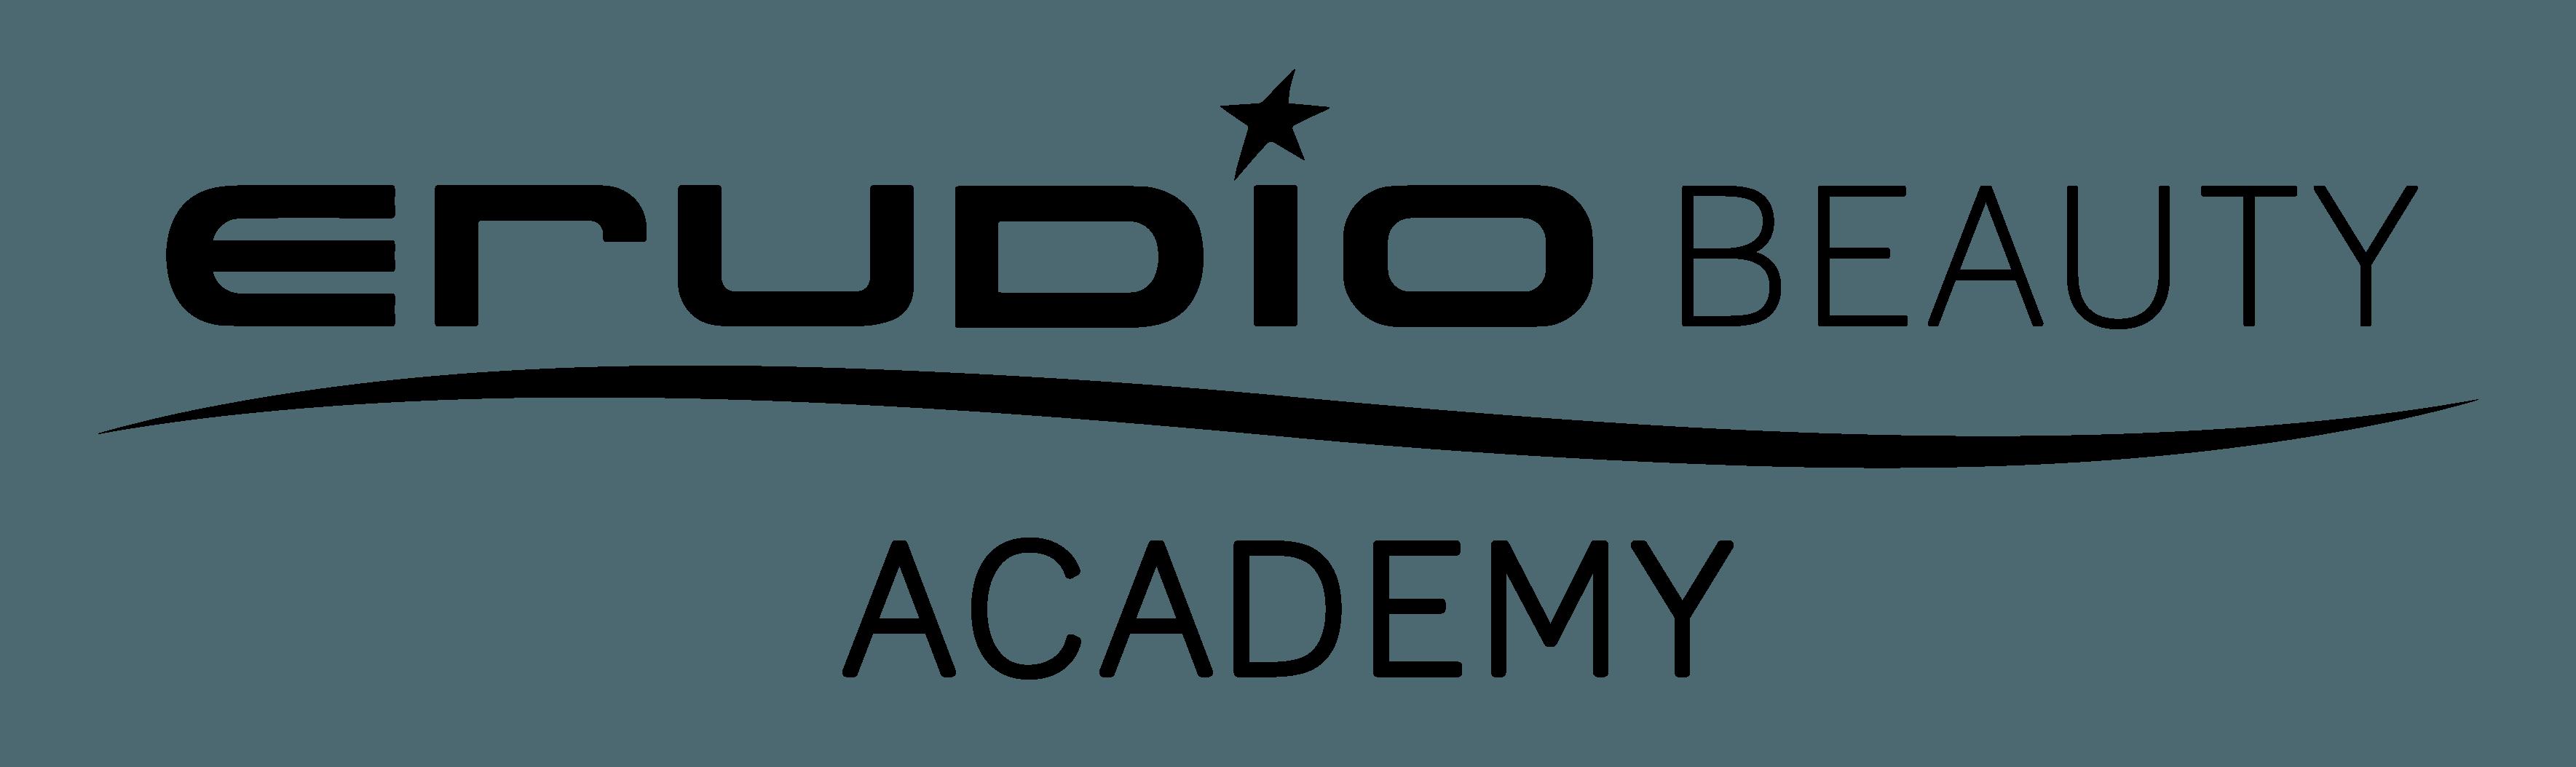 erudio beauty logo